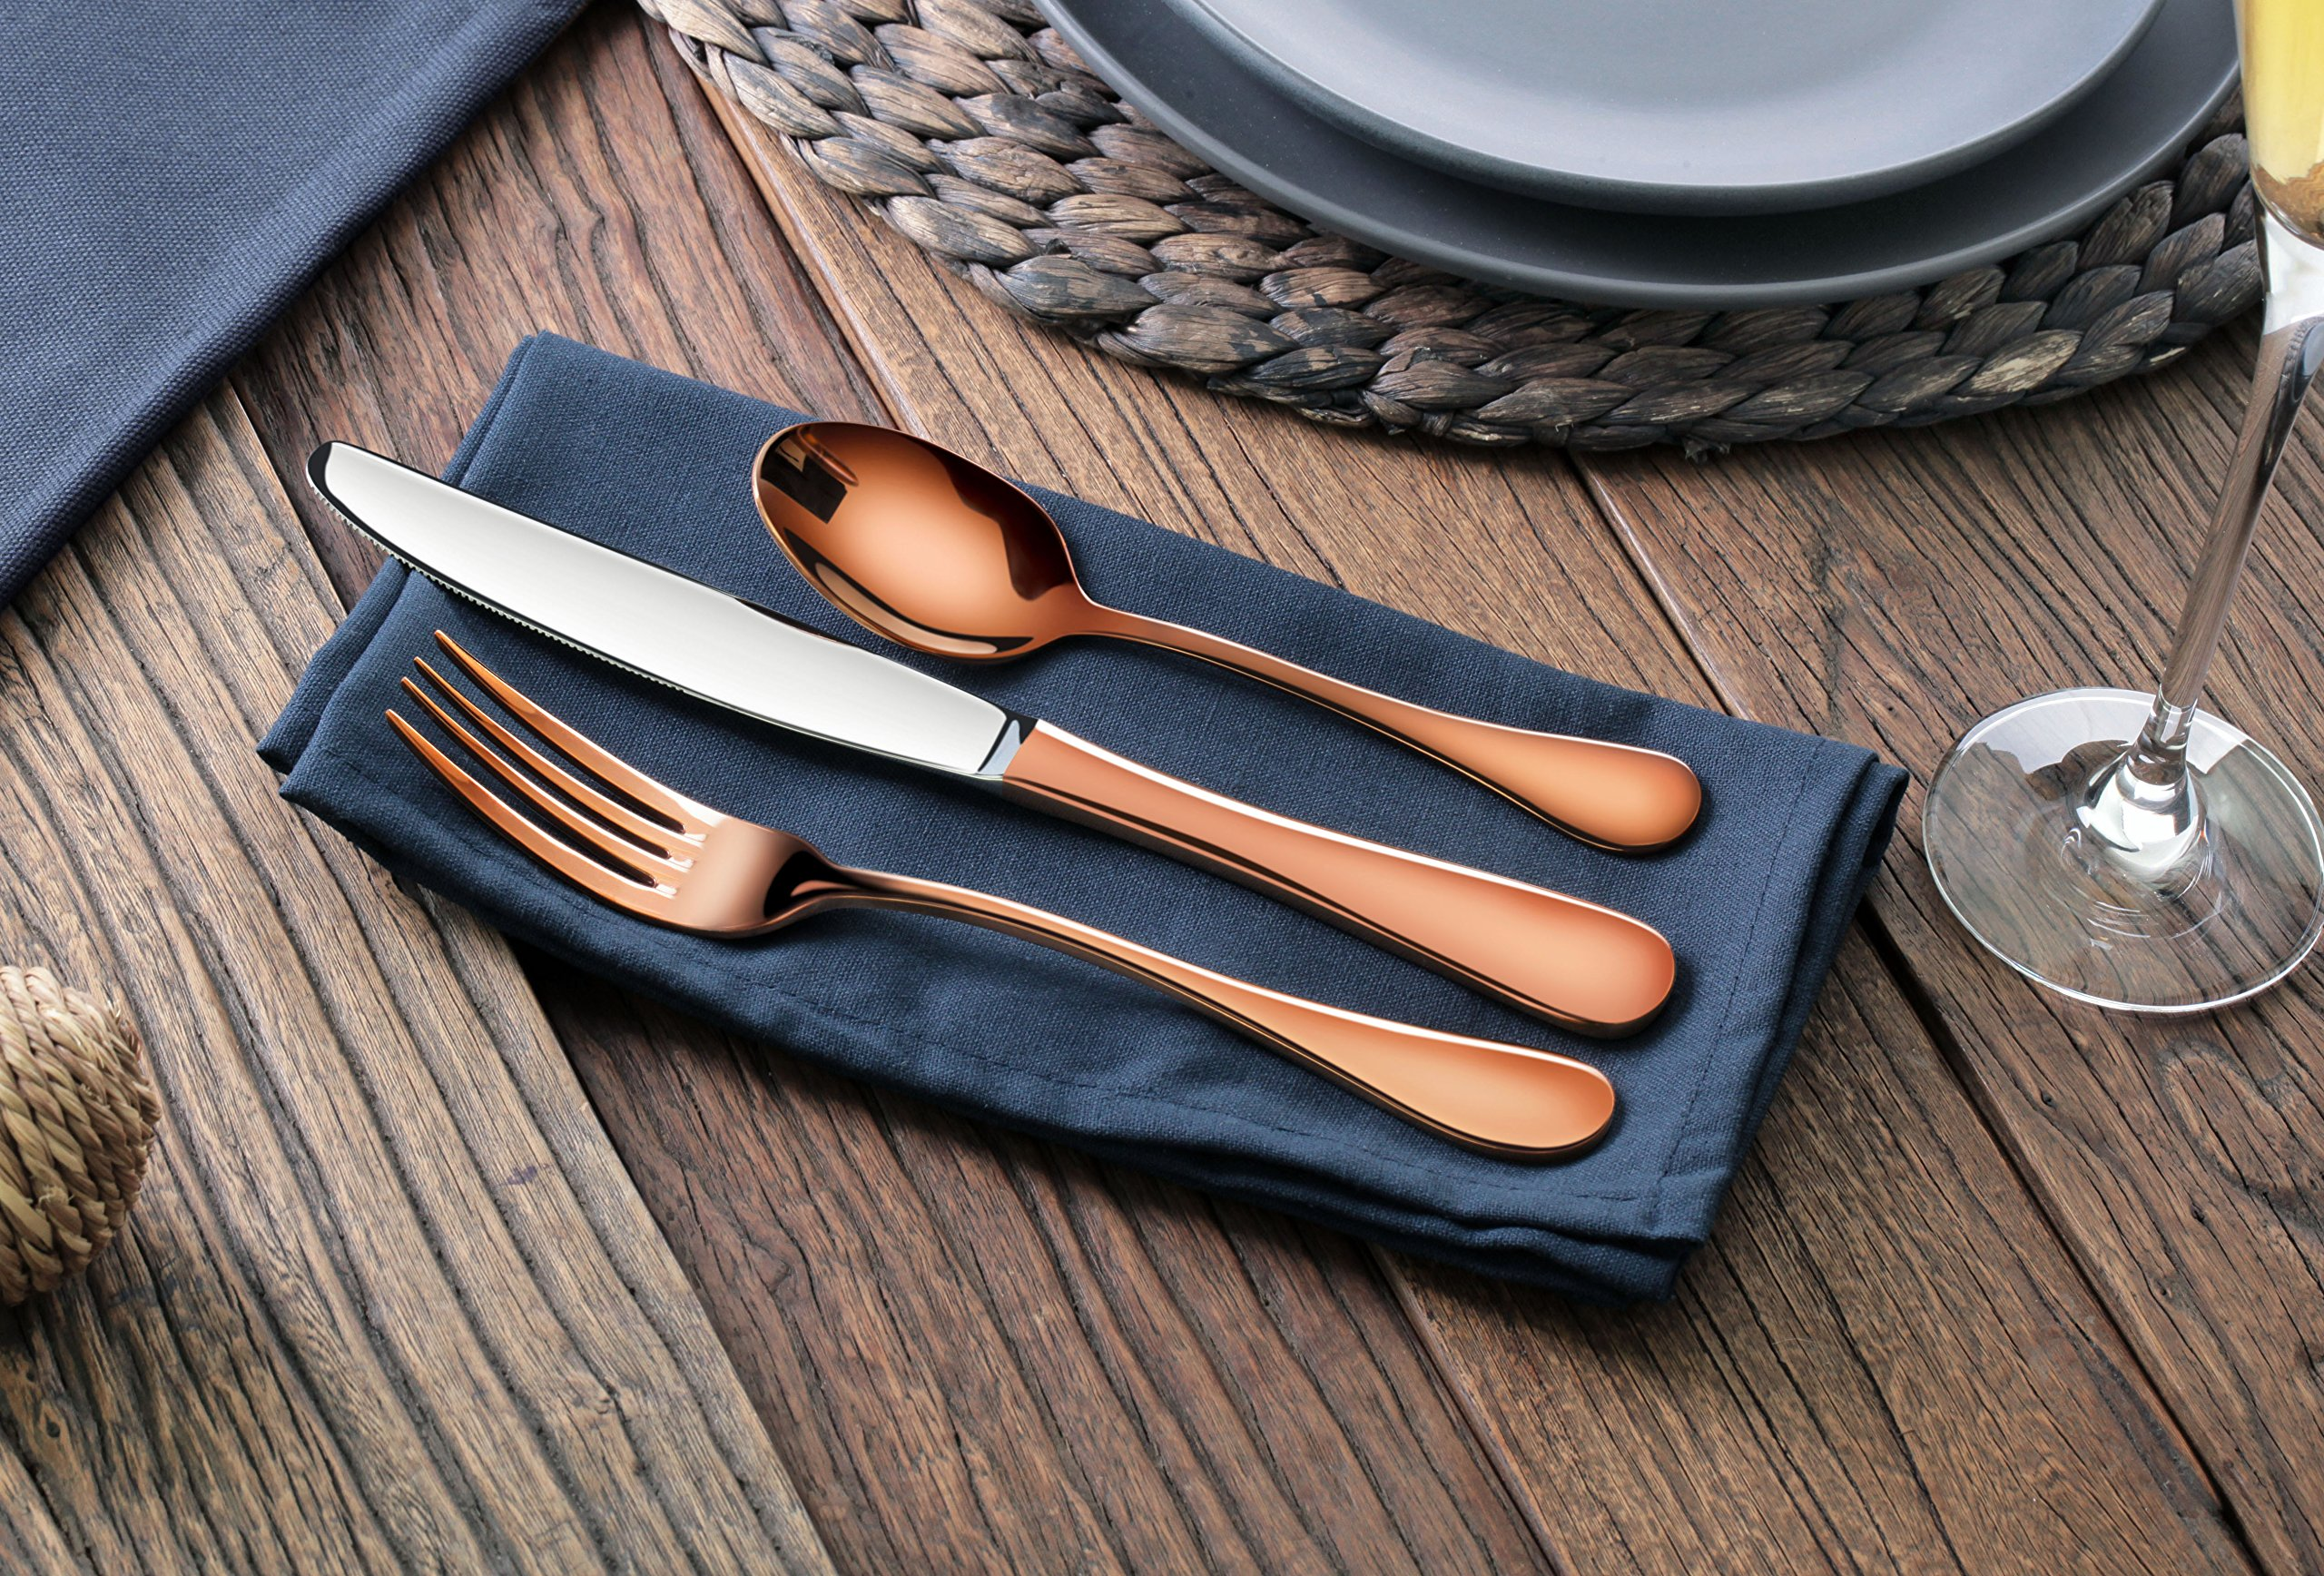 Artaste 56419 Rain 18/10 Stainless Steel Flatware 36 Piece Set, Antique Copper Finished, Service for 12 by Artaste (Image #3)